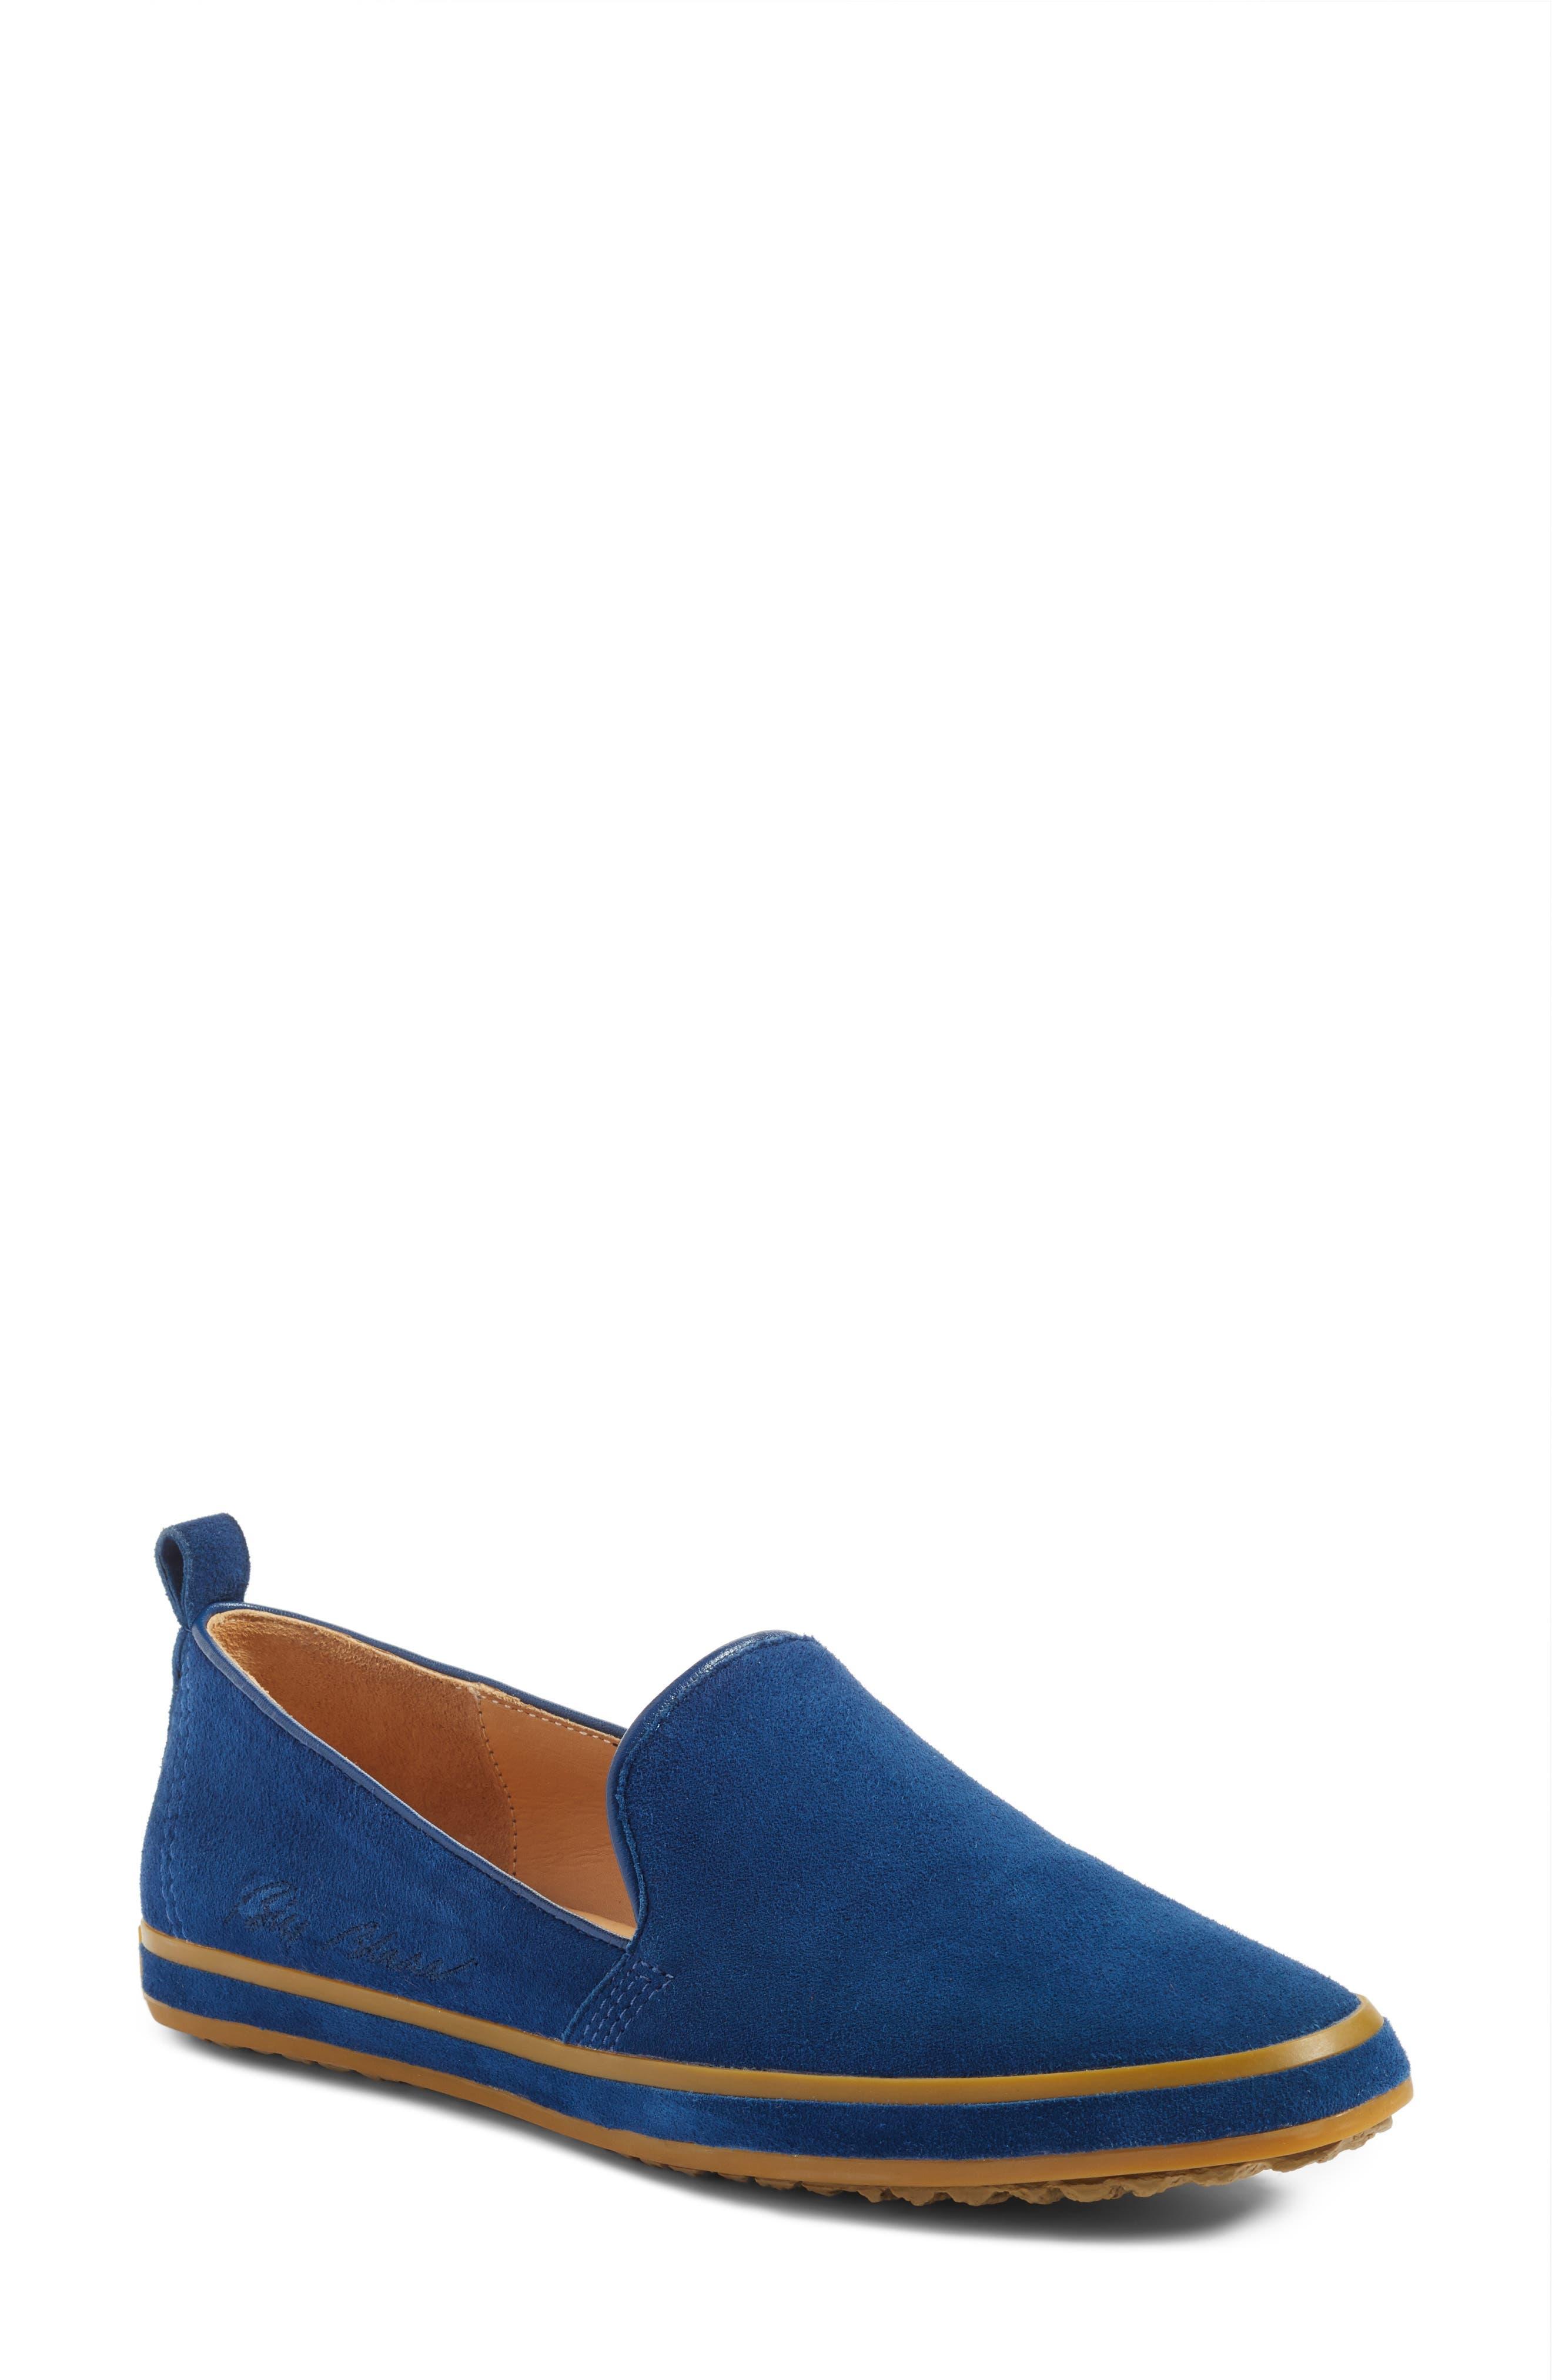 Sutton Slip-On Loafer,                         Main,                         color, 411